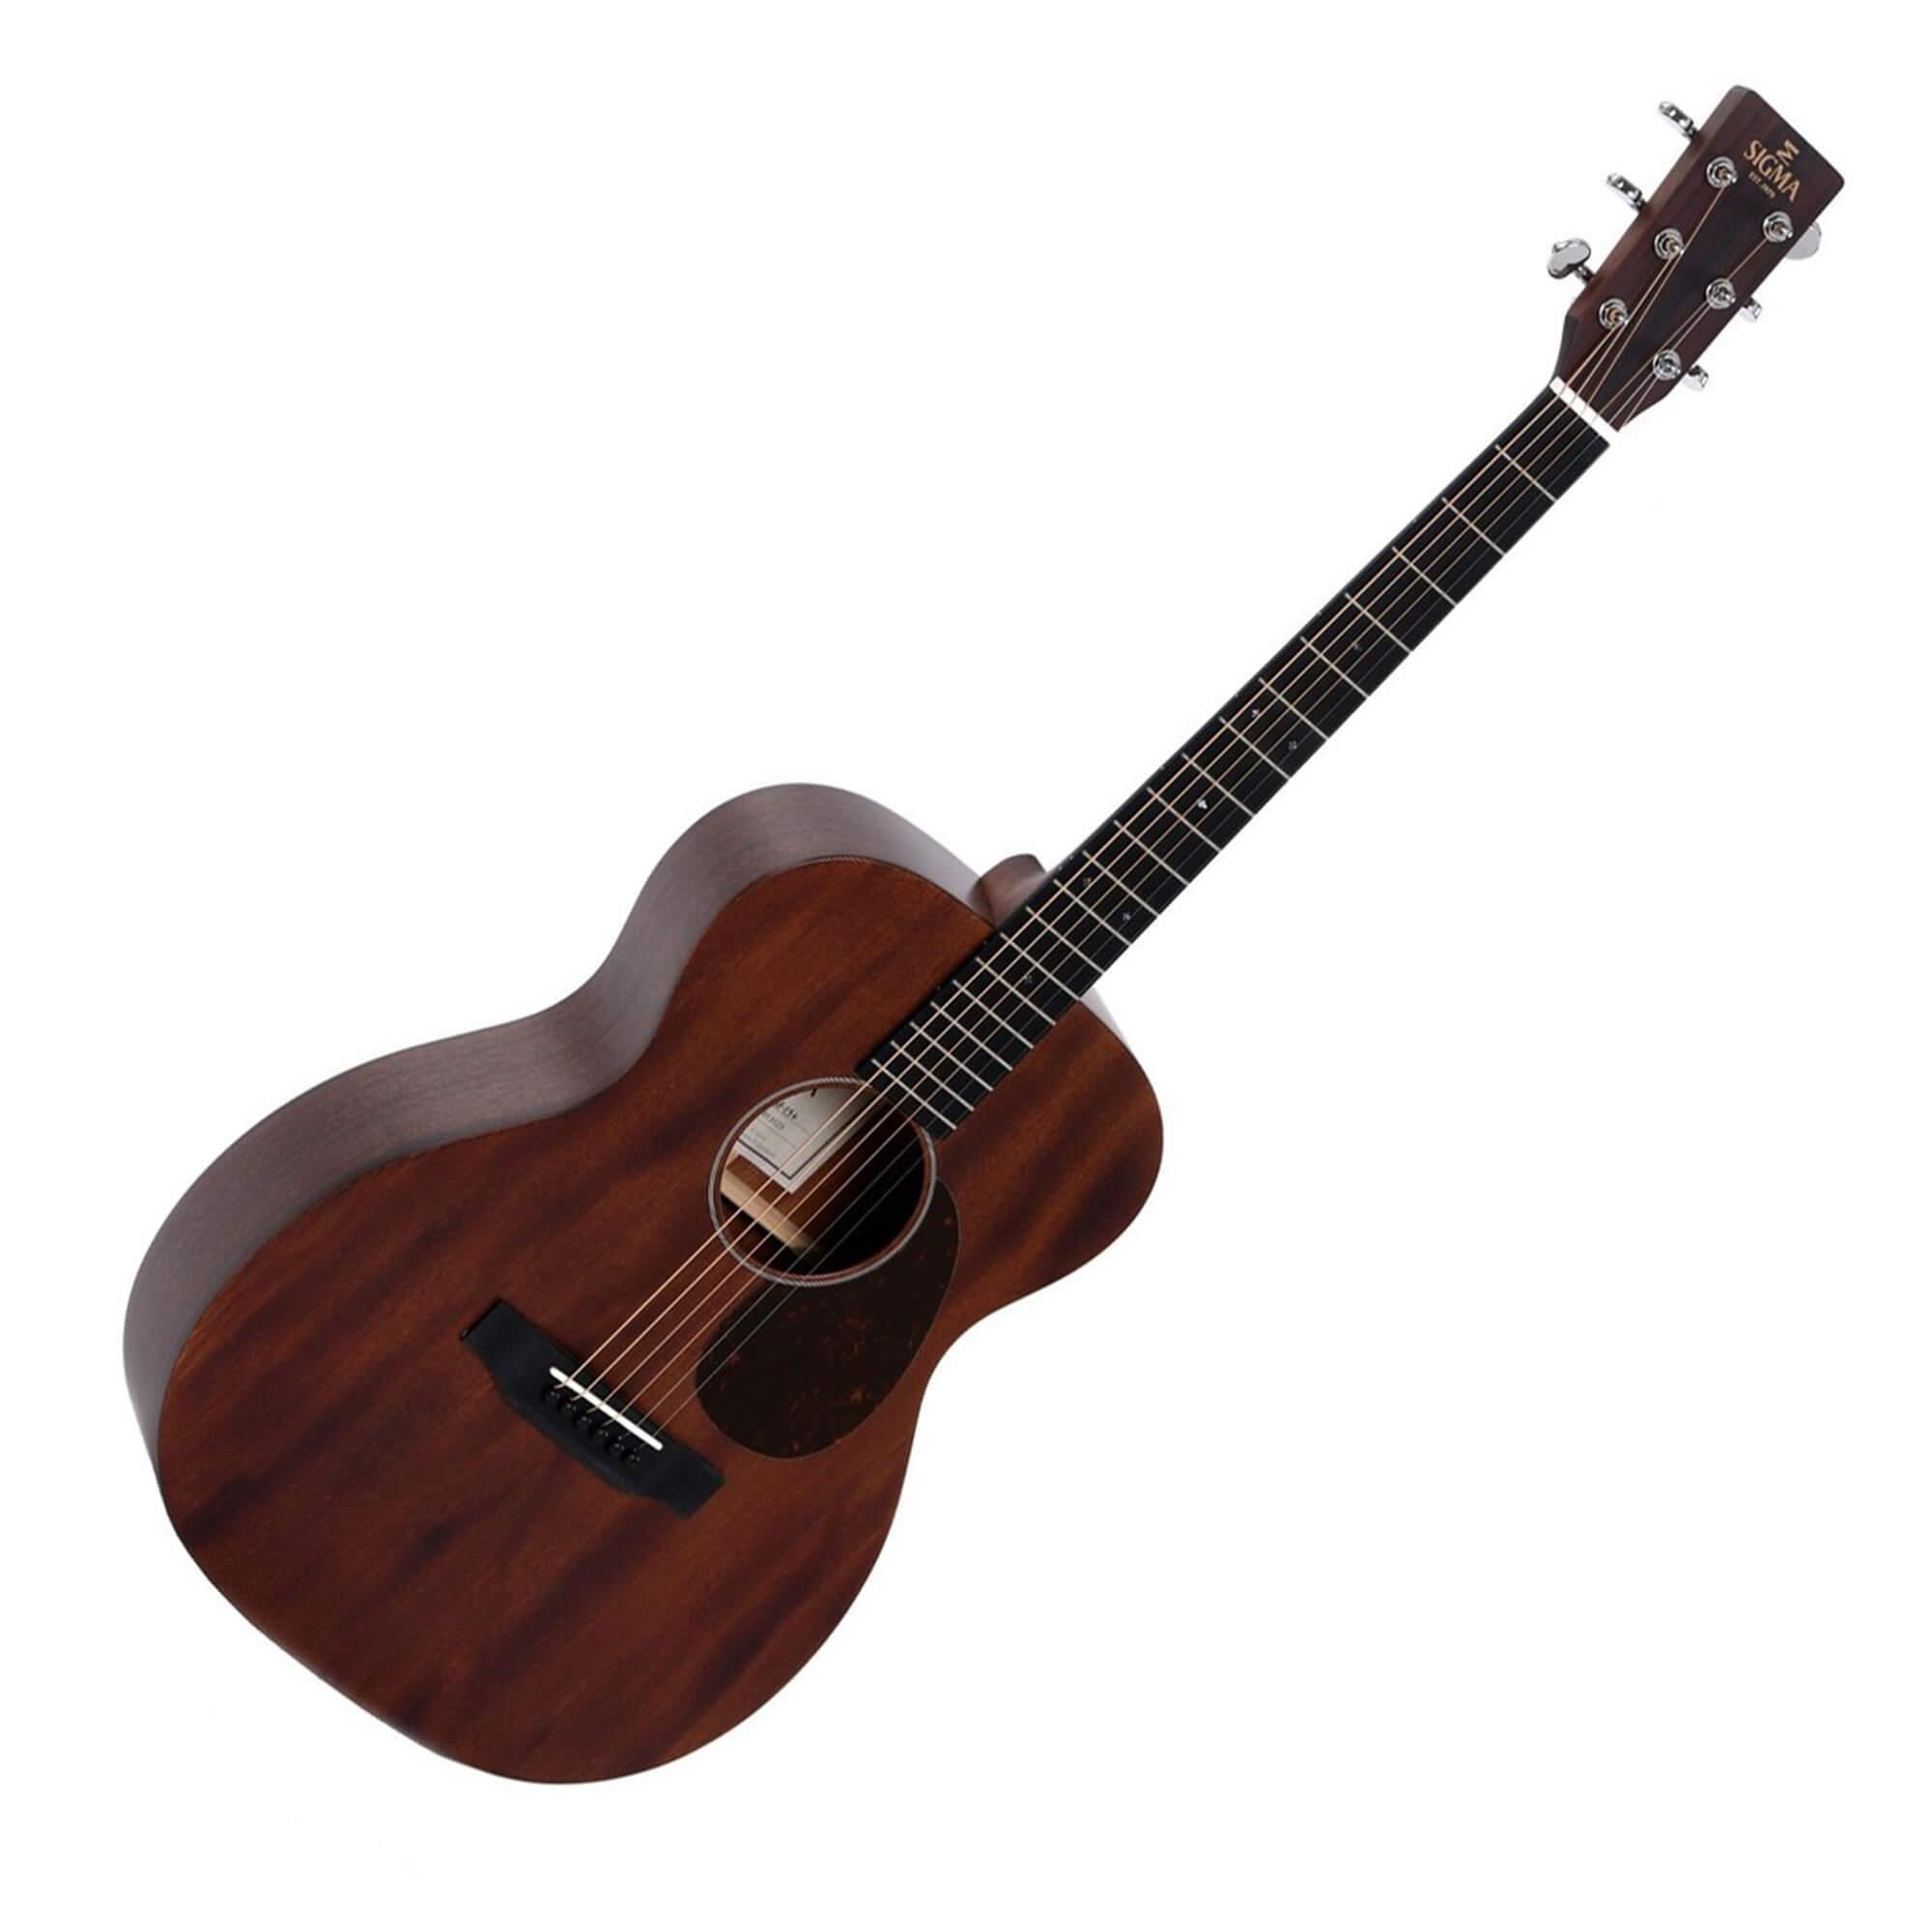 Sigma 15 Series 00M-15+ Acoustic Guitar